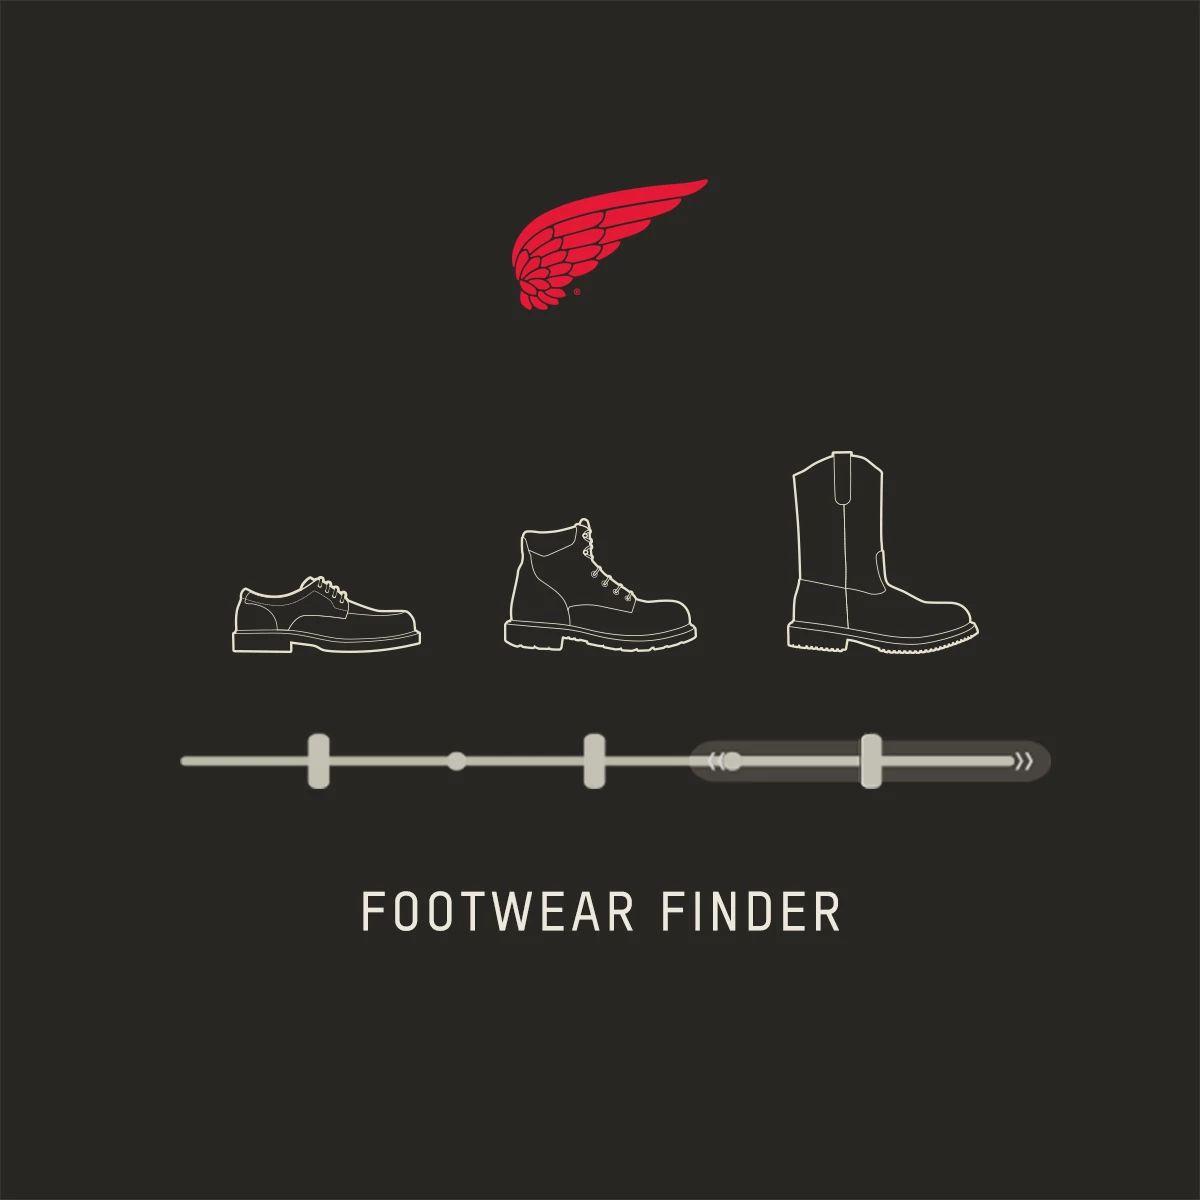 Footwear Finder